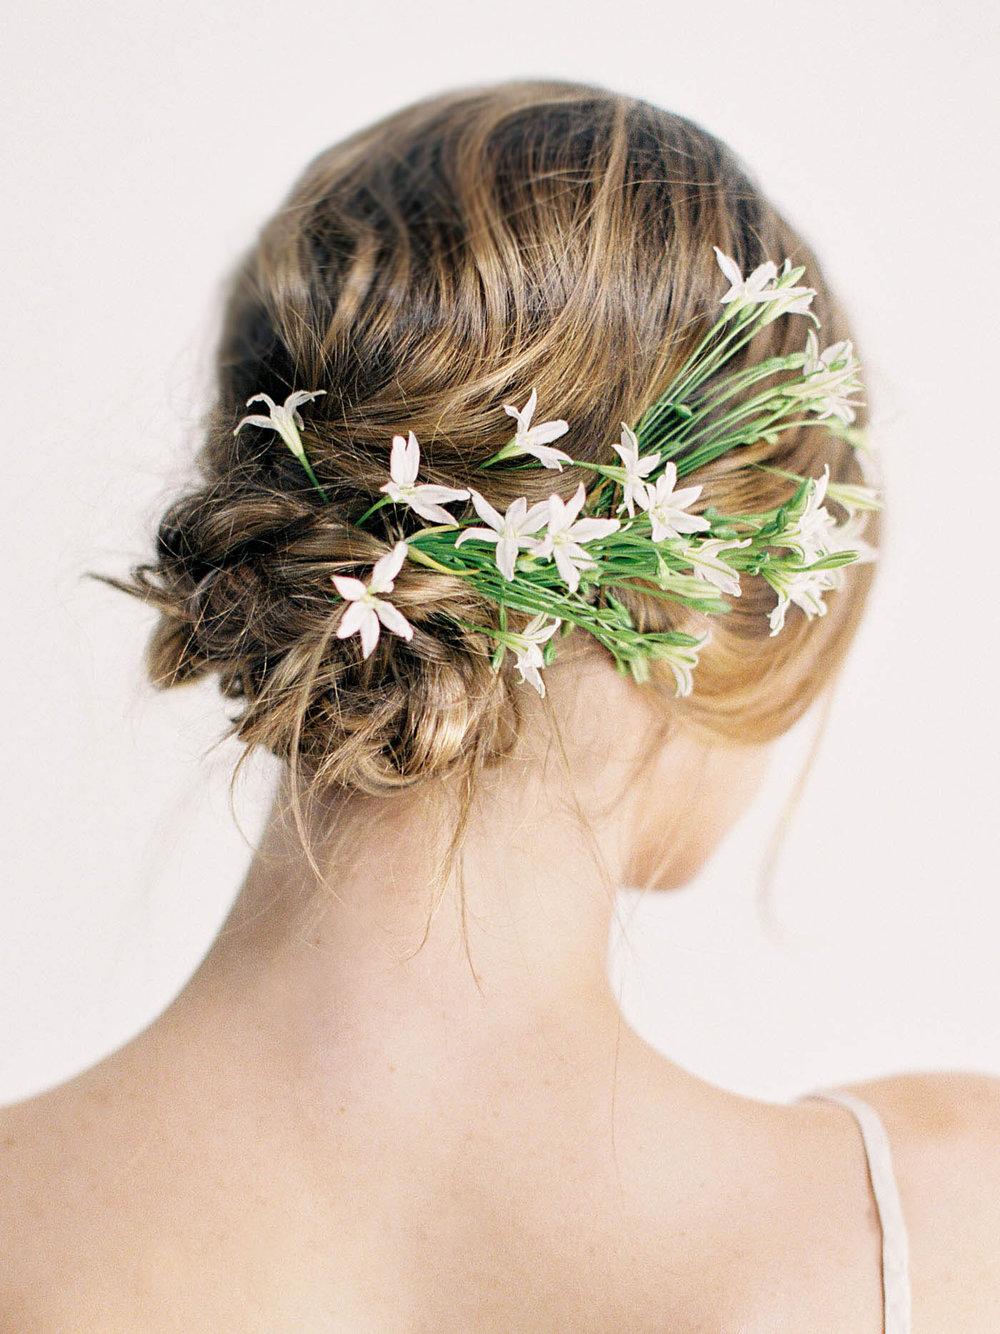 floral-crown-7-Jen_Huang-006838-R1-E011.jpg